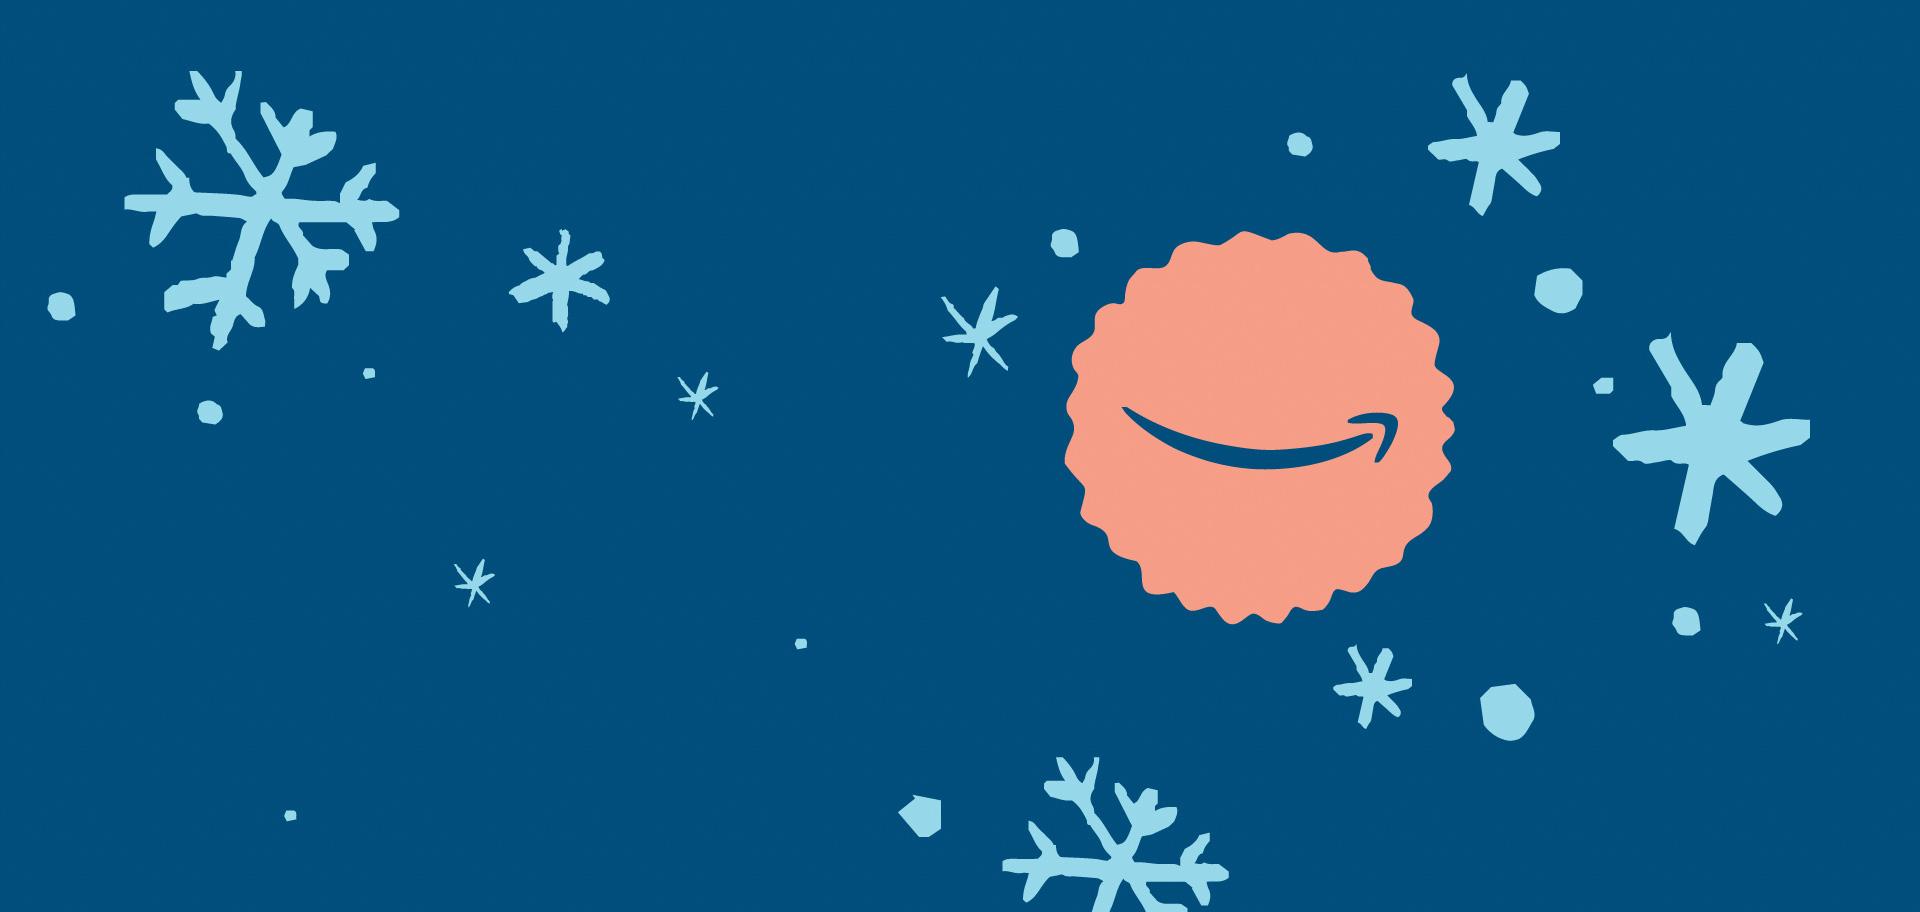 Printed Perfection: Amazon's Toy Catalog Design Makes Us Smile